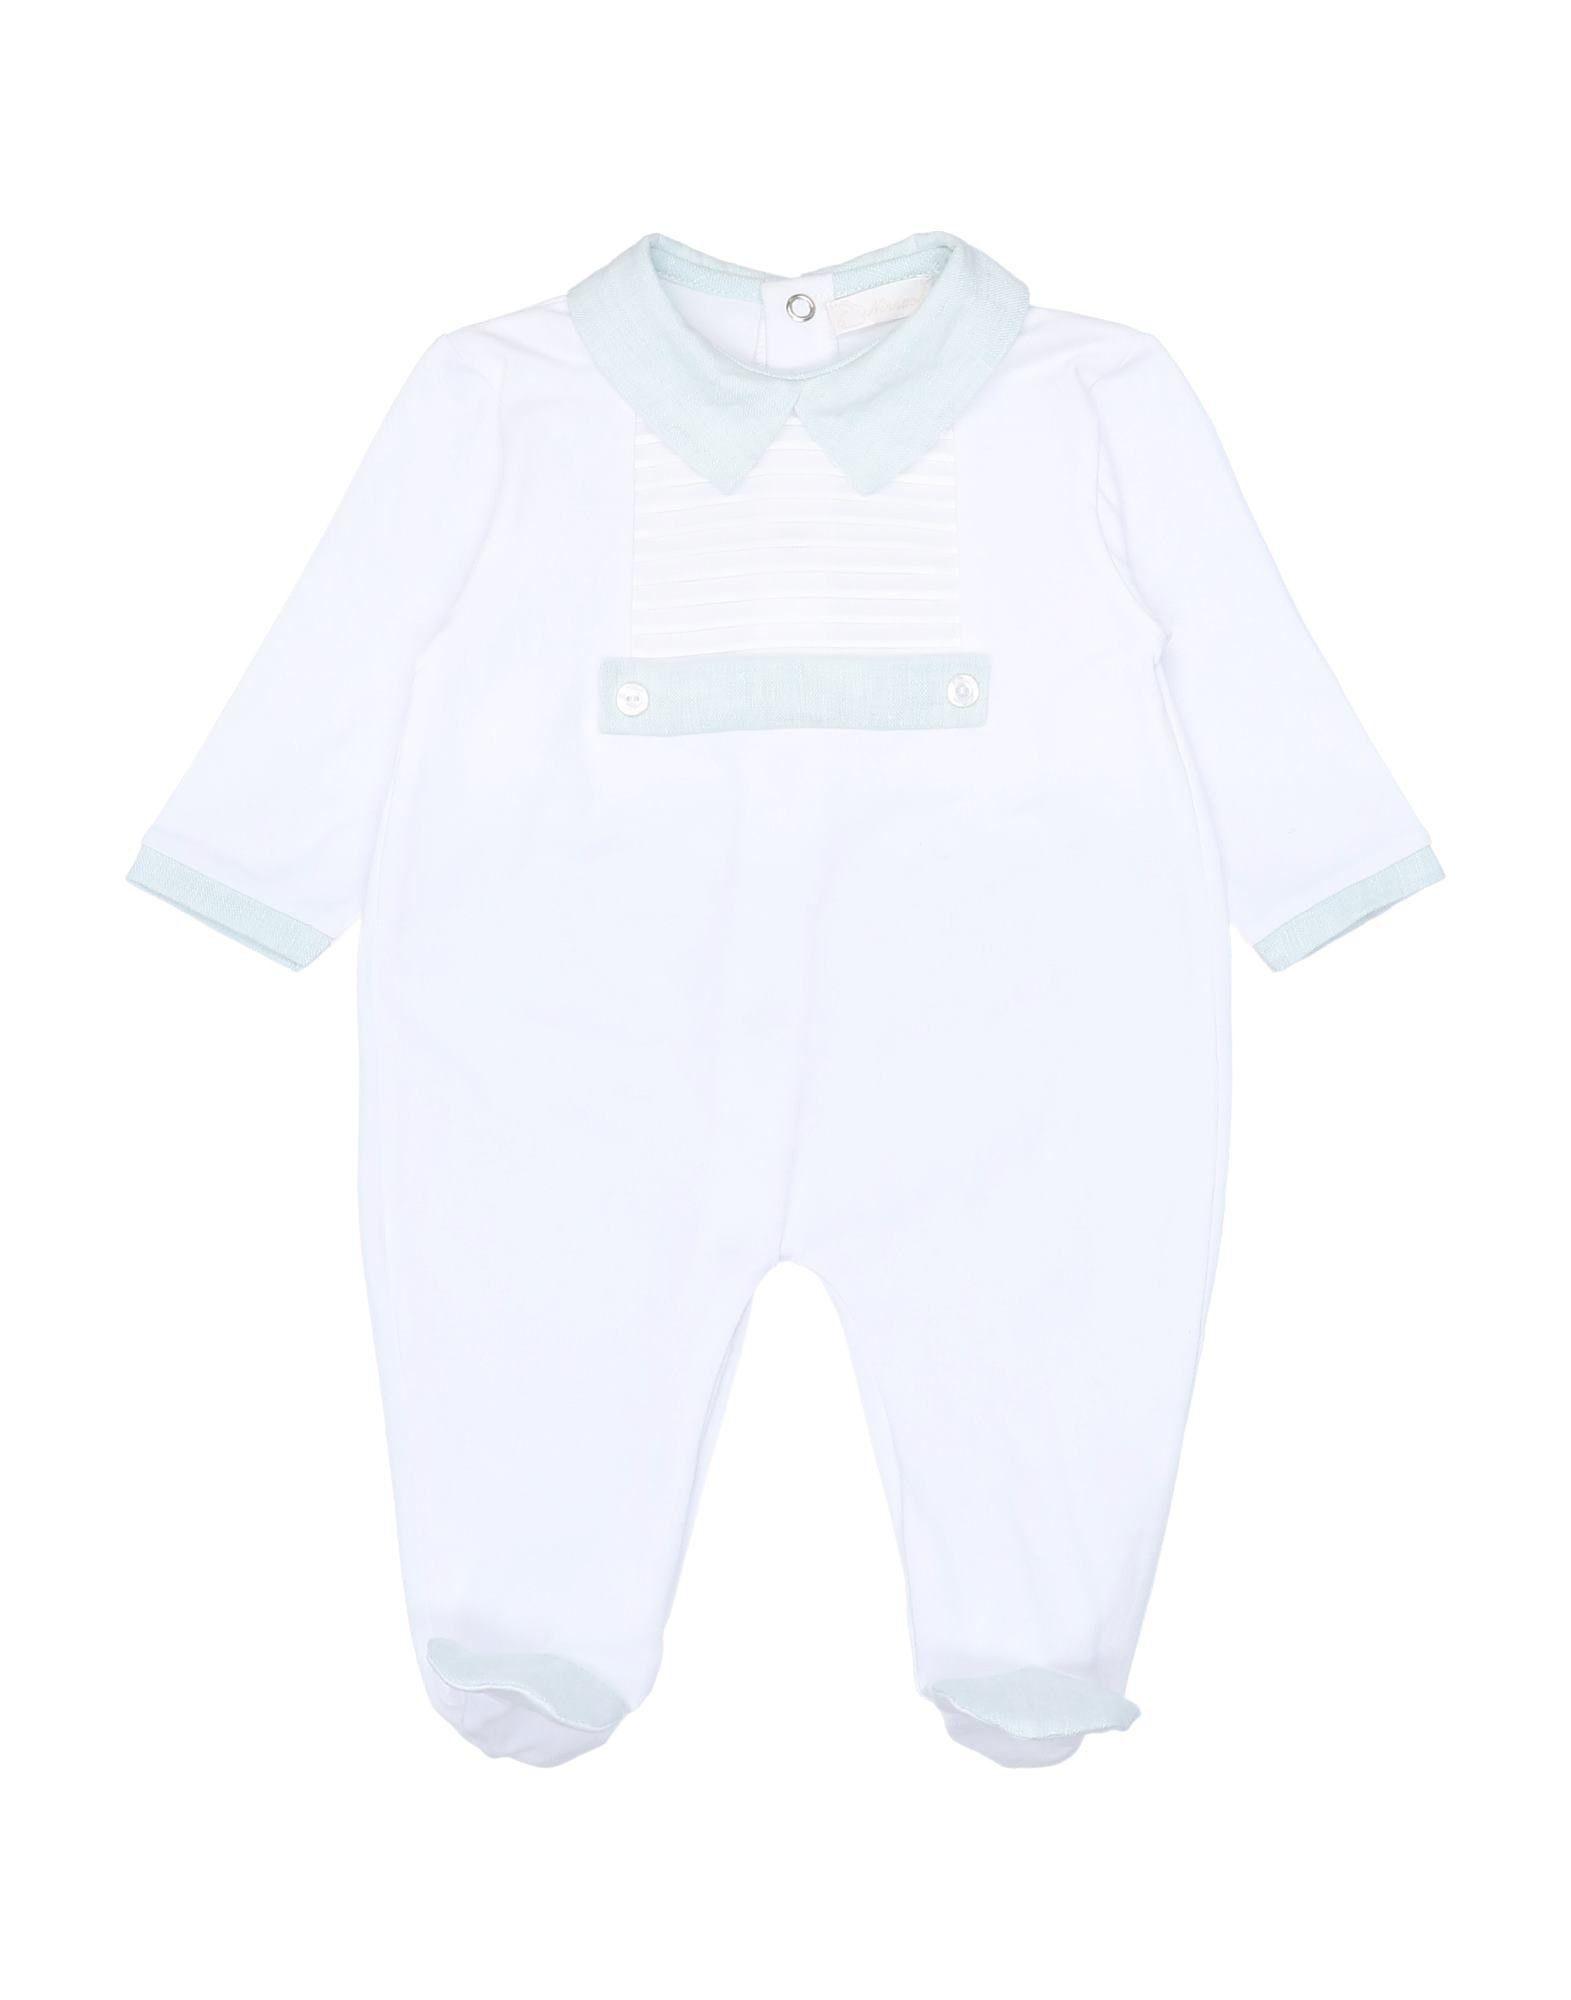 YOOX.COM(ユークス)《セール開催中》NINNAOH ボーイズ 0-24 ヶ月 乳幼児用ロンパース ホワイト 3 コットン 96% / ポリウレタン 4%